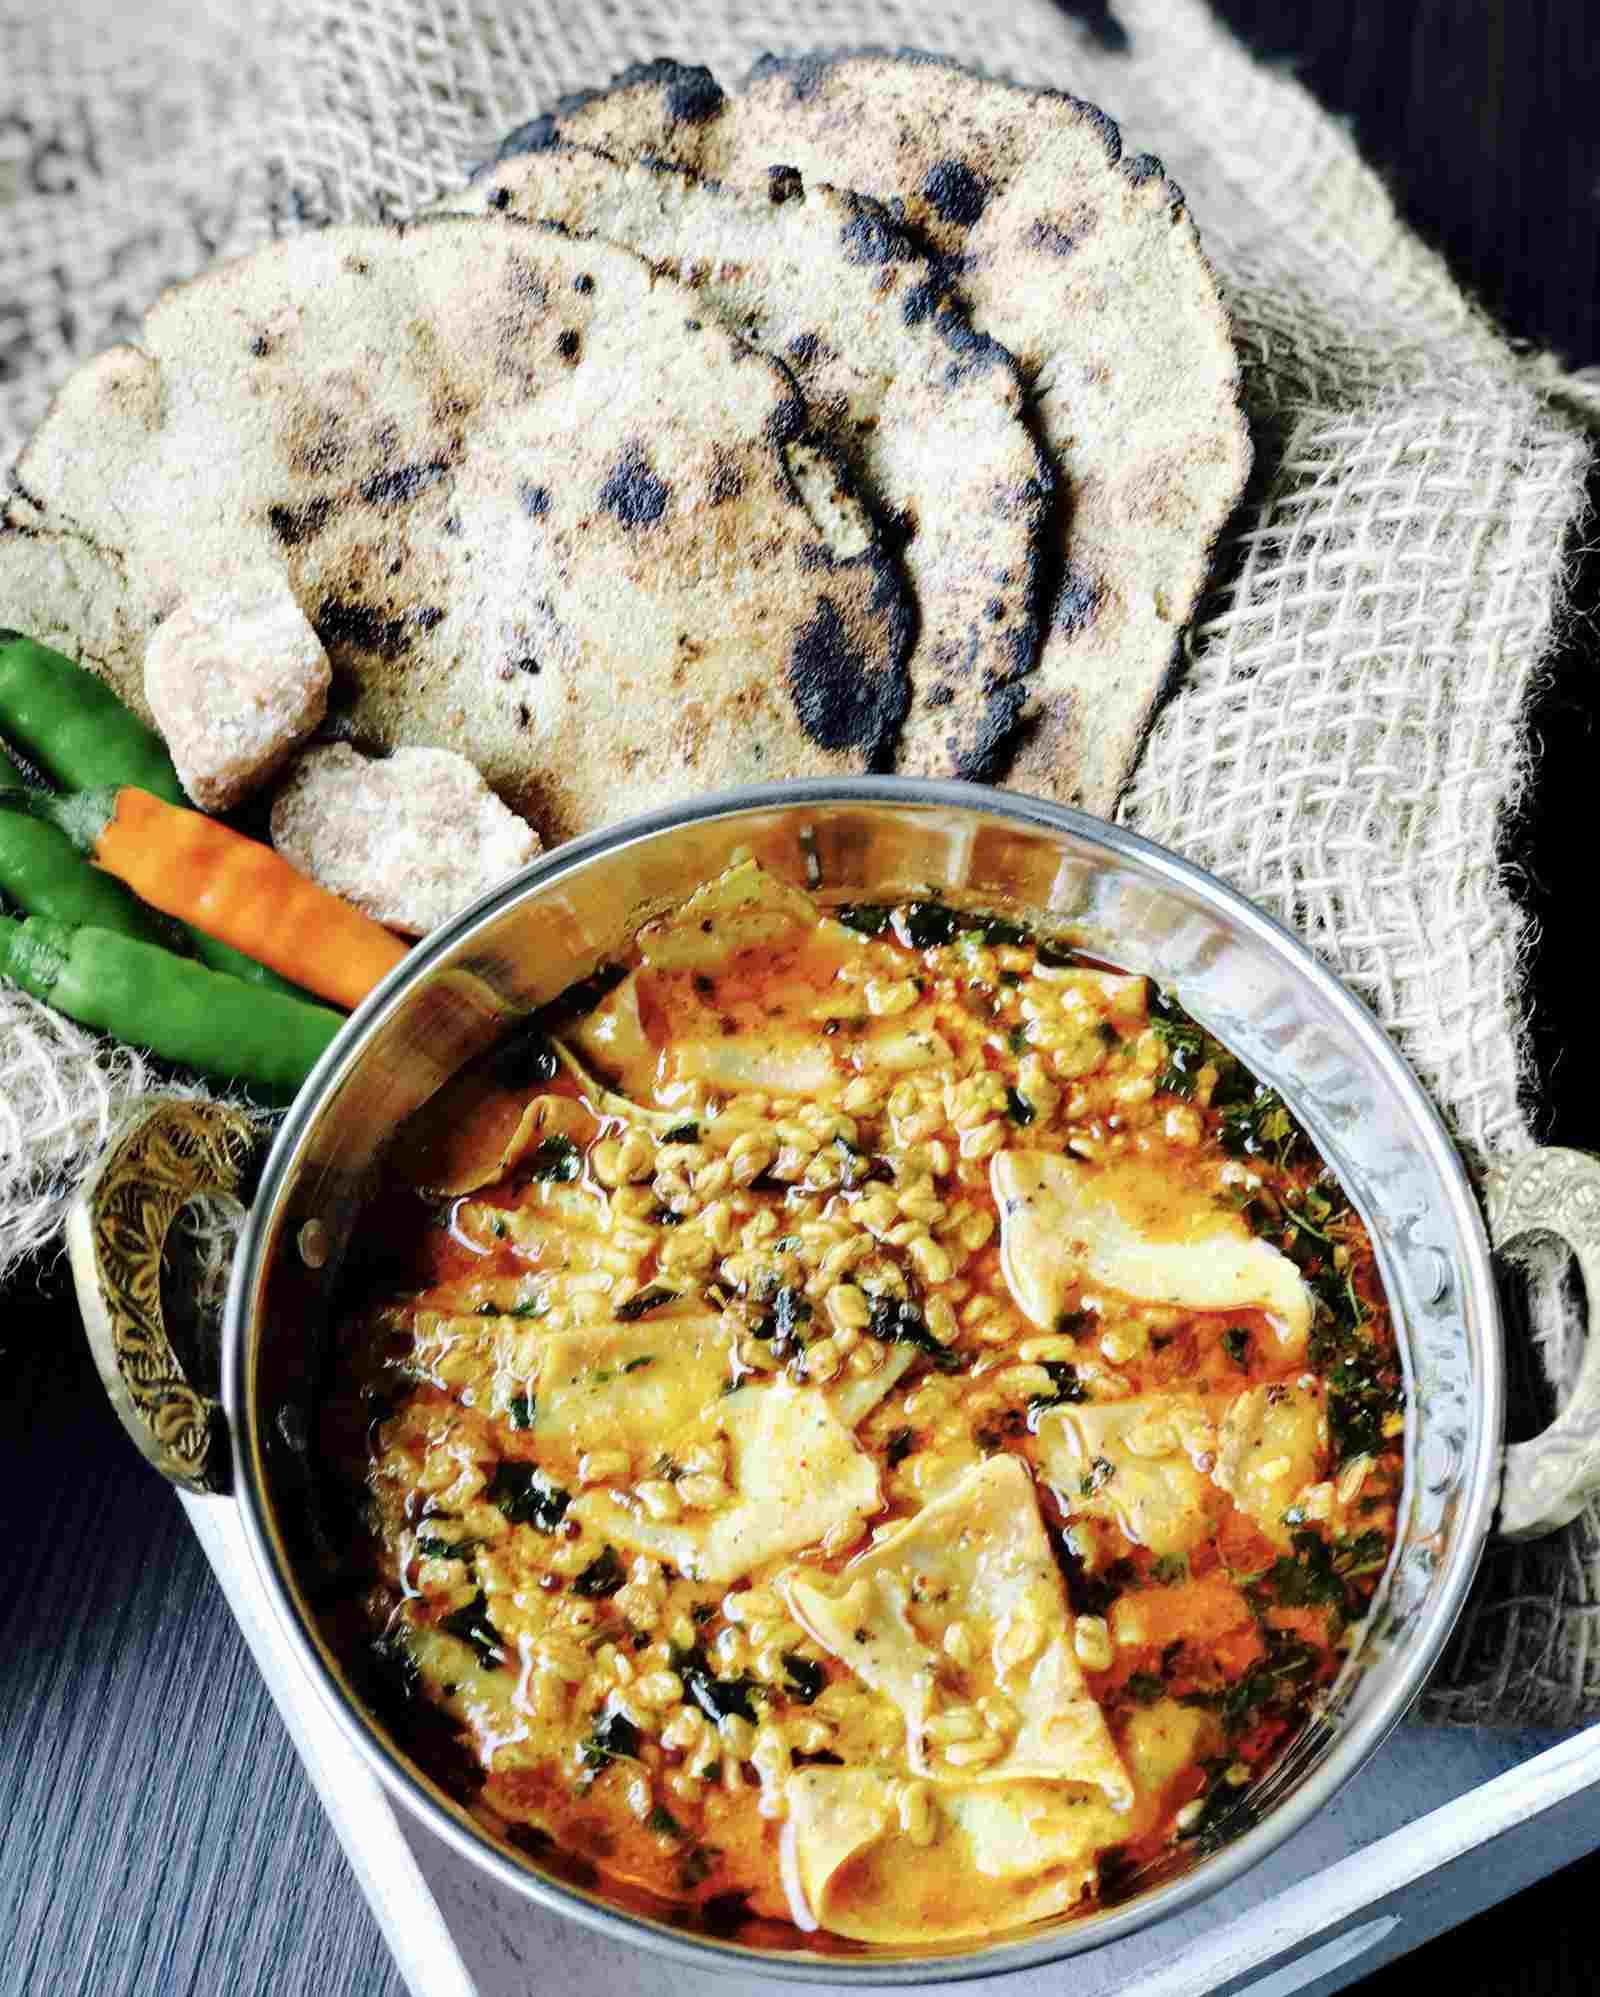 Rajasthani dana methi papad ka saag recipe by archanas kitchen rajasthani dana methi papad ka saag recipe forumfinder Choice Image